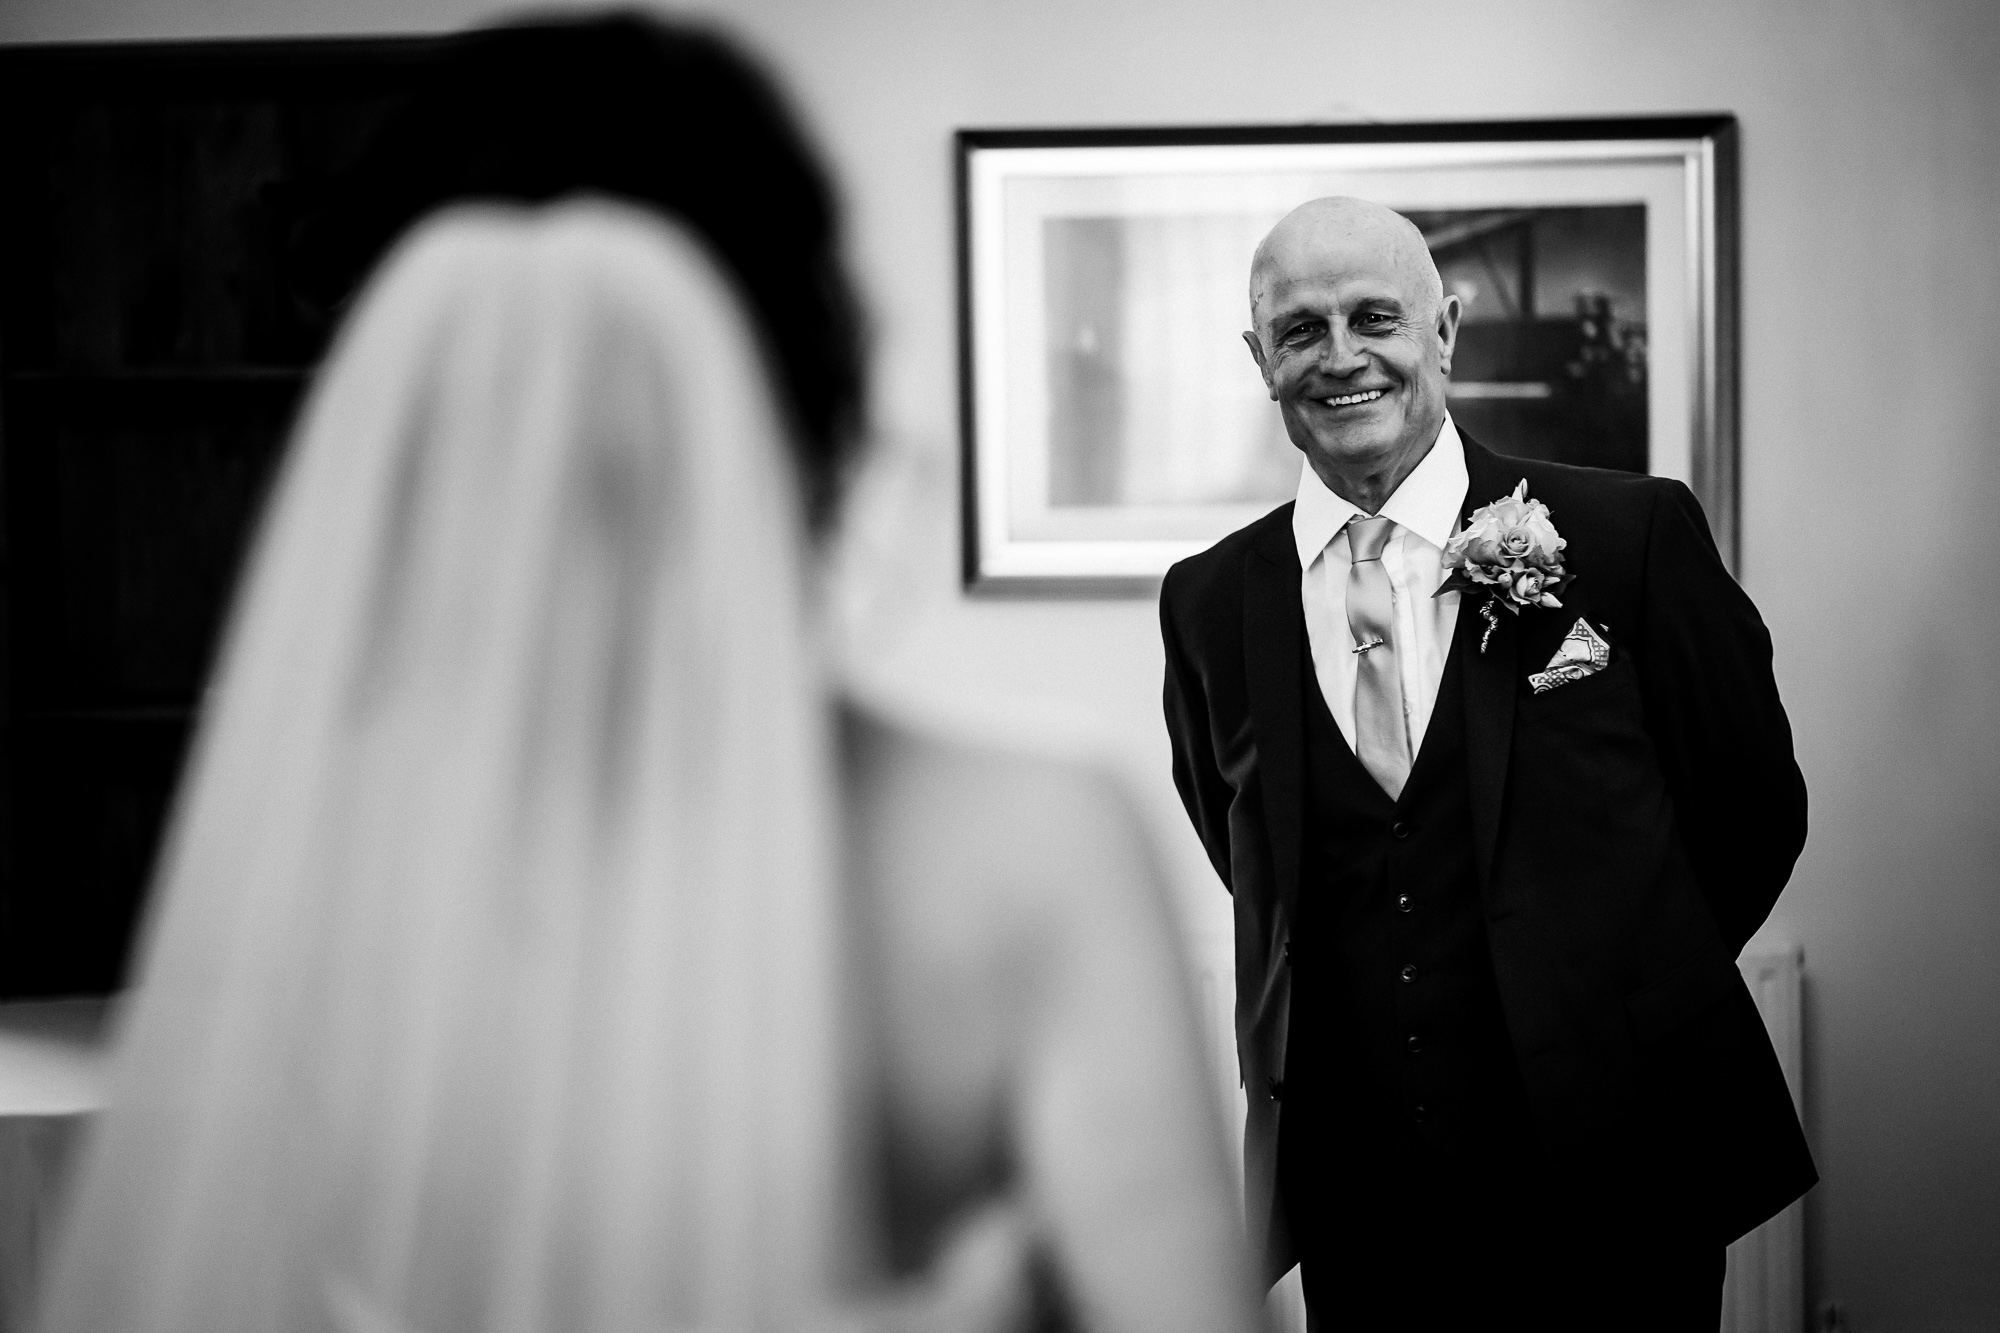 West Tower Wedding Venue Orkskirk Lancashire Wedding Photography cheshire wedding photographer (10 of 47).jpg